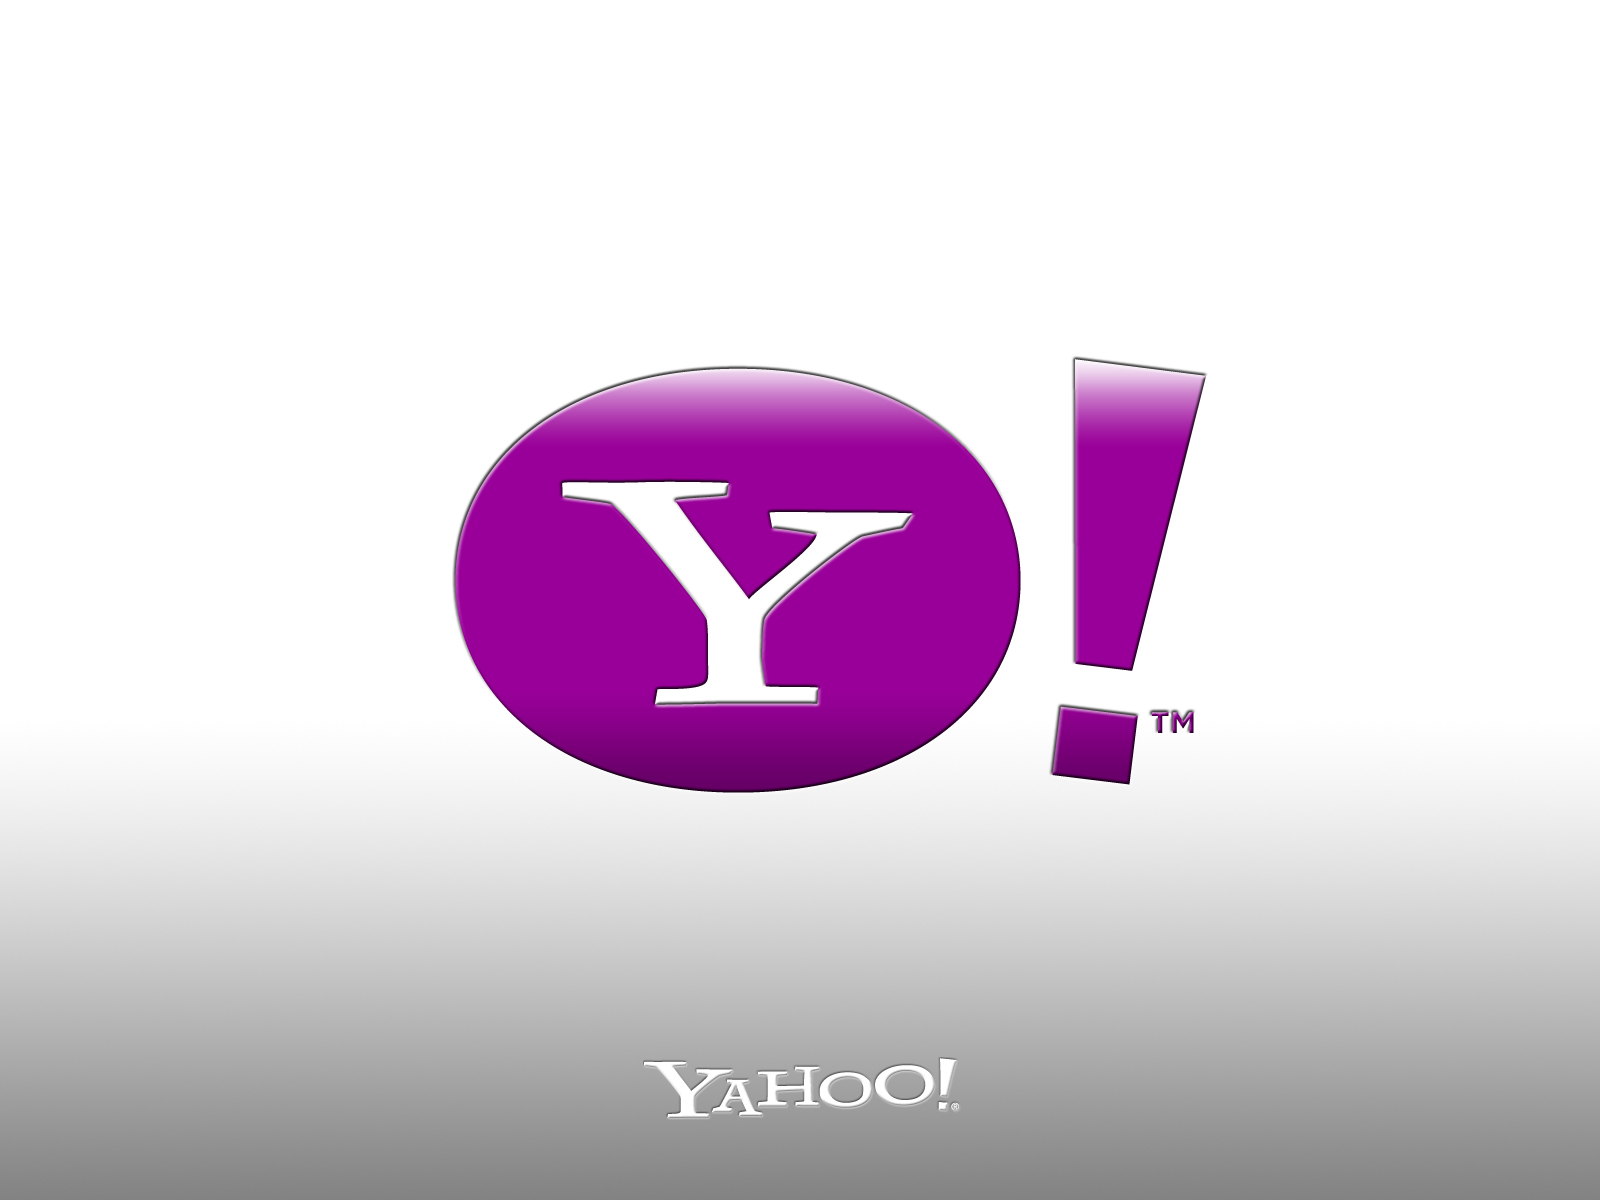 Yahoo threatens Facebook as patent war looms